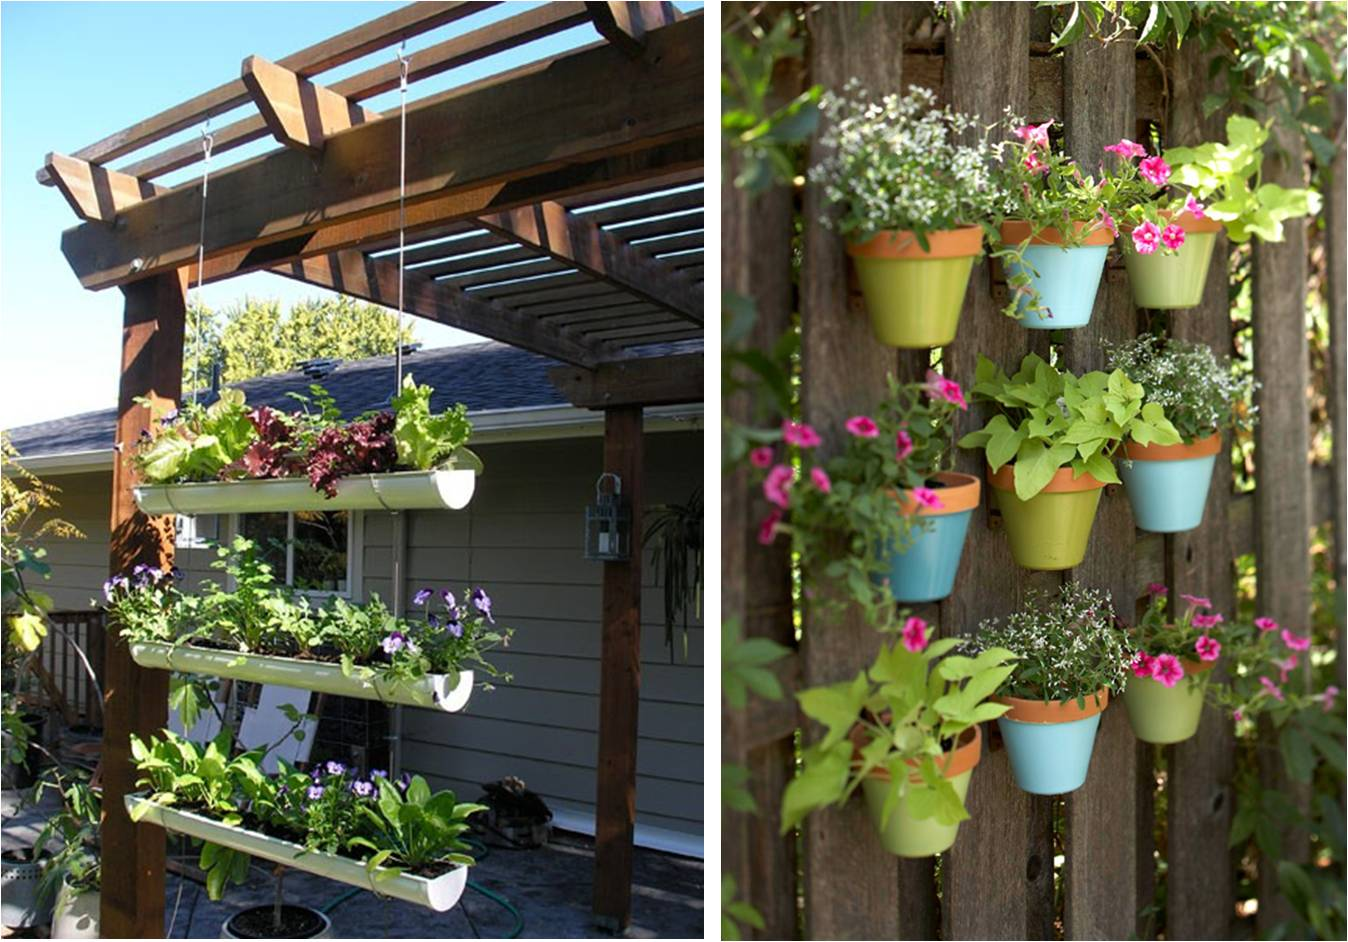 como fazer um jardim jardim vertical jardim vertical simples e barato